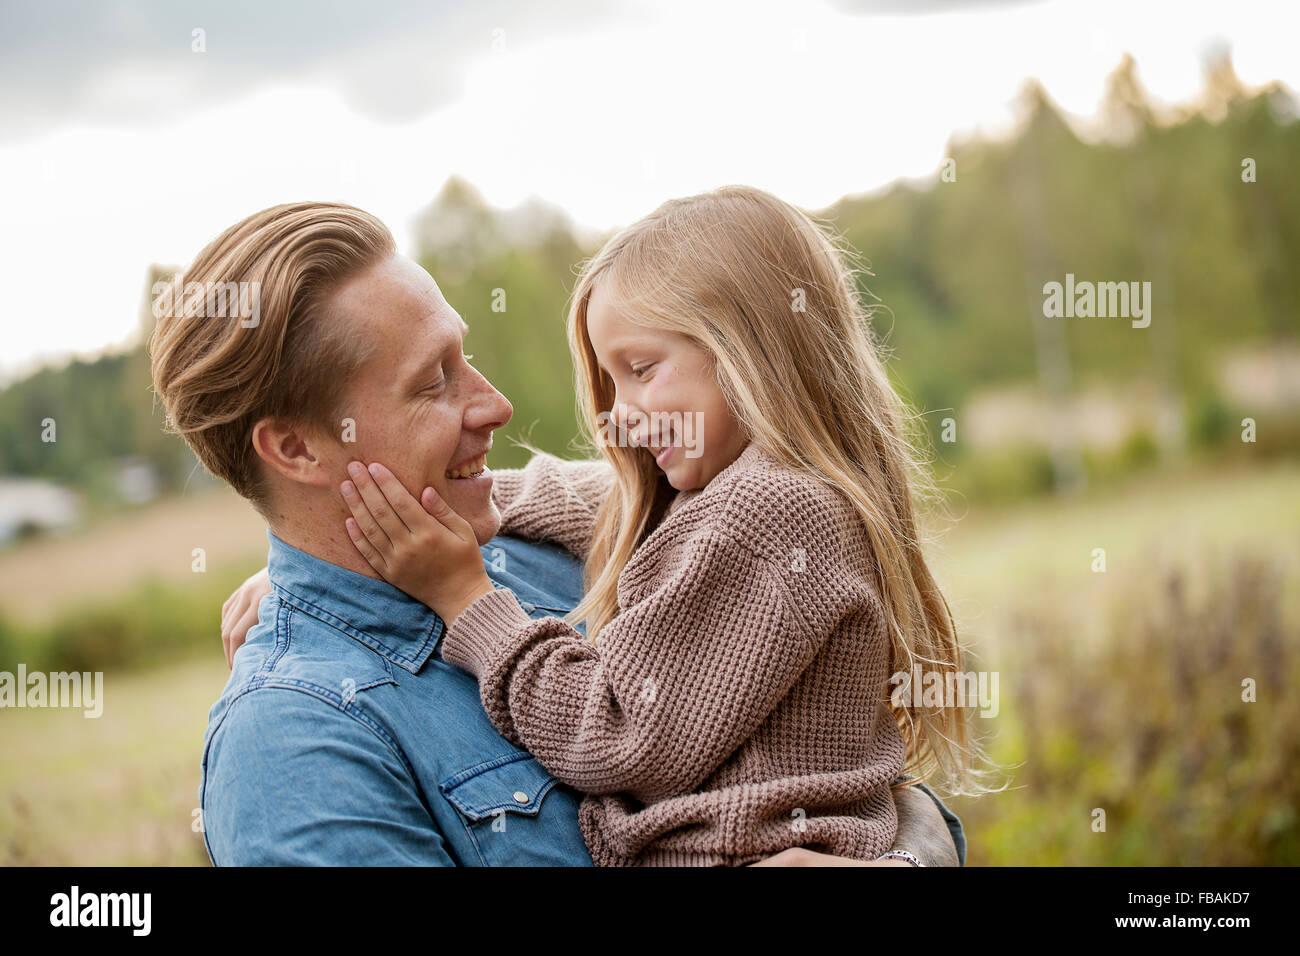 La Finlande, Uusimaa, Raasepori, Karjaa, père des liens avec sa fille (6-7) Photo Stock